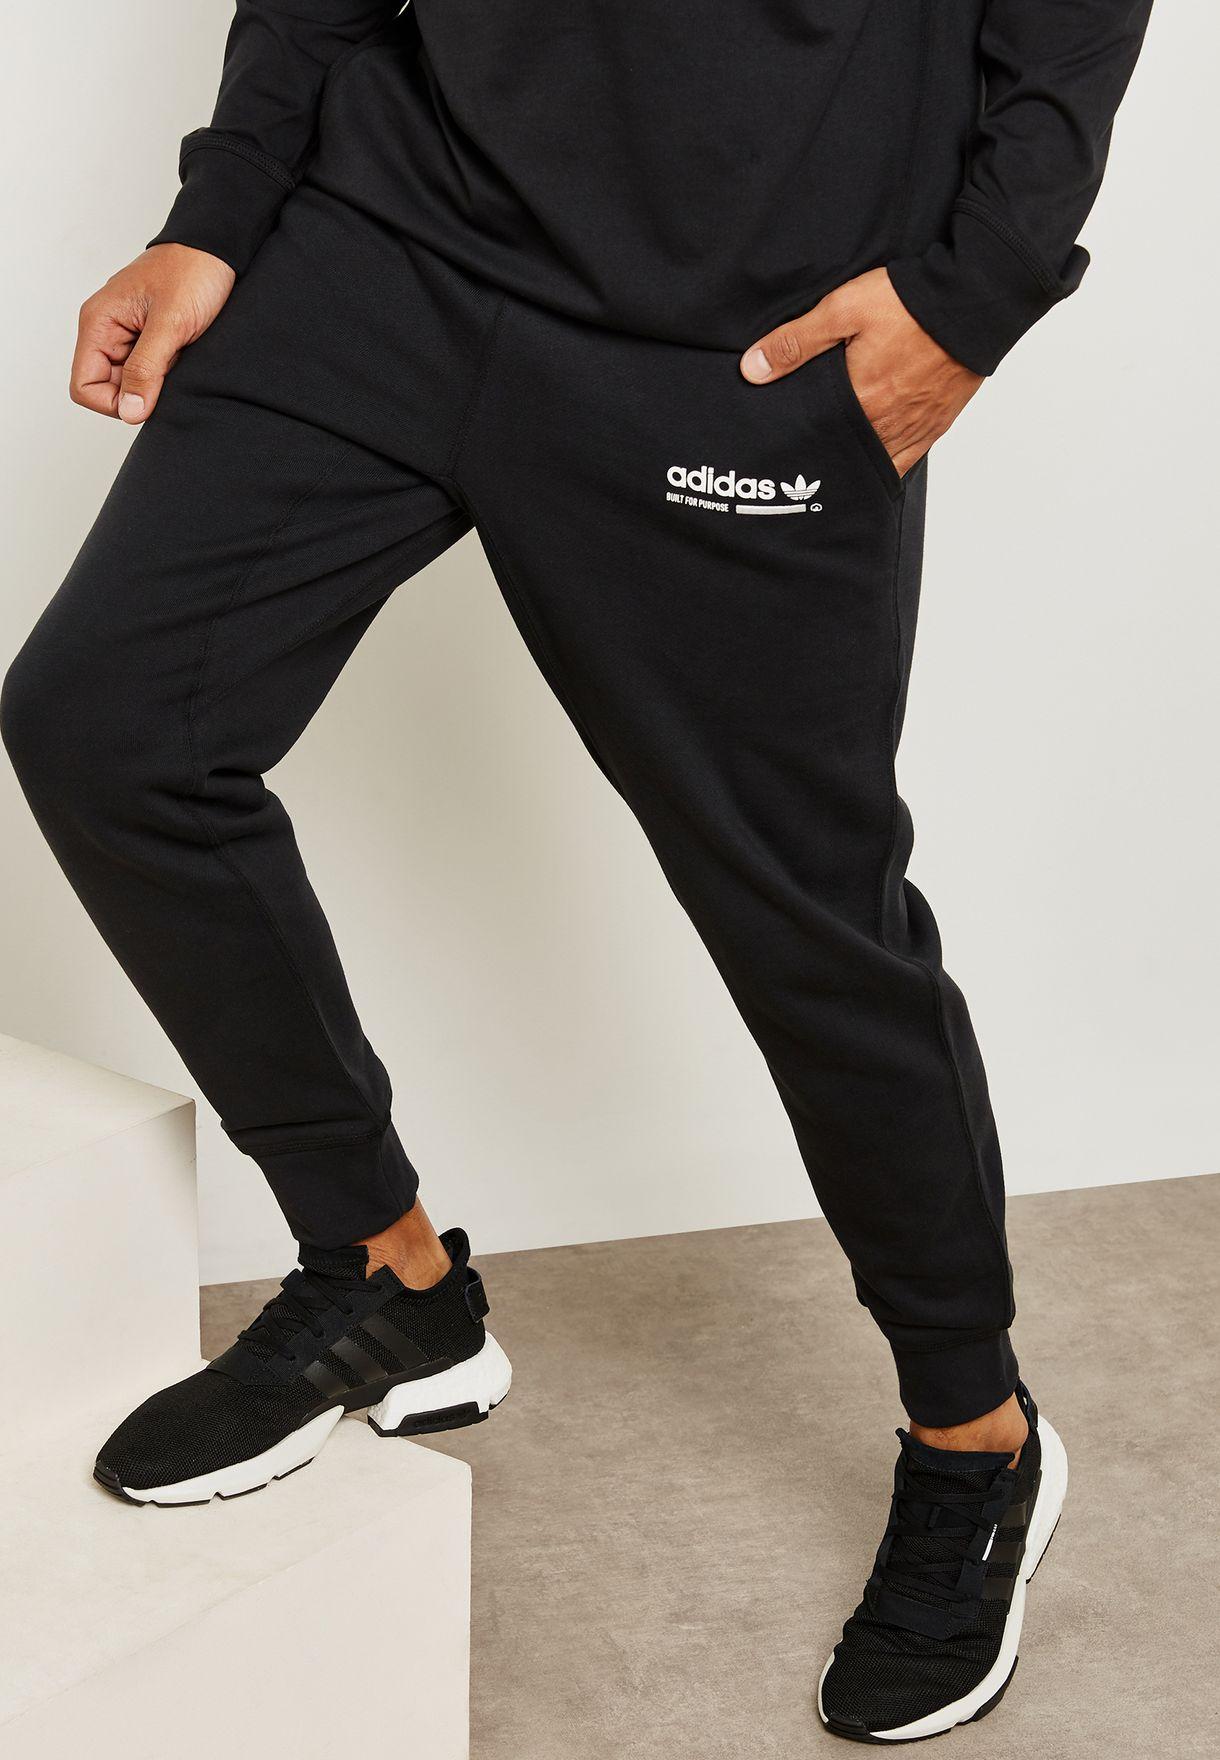 a45b84ac7 Shop adidas Originals black Kaval Sweatpants DH4936 for Men in UAE ...